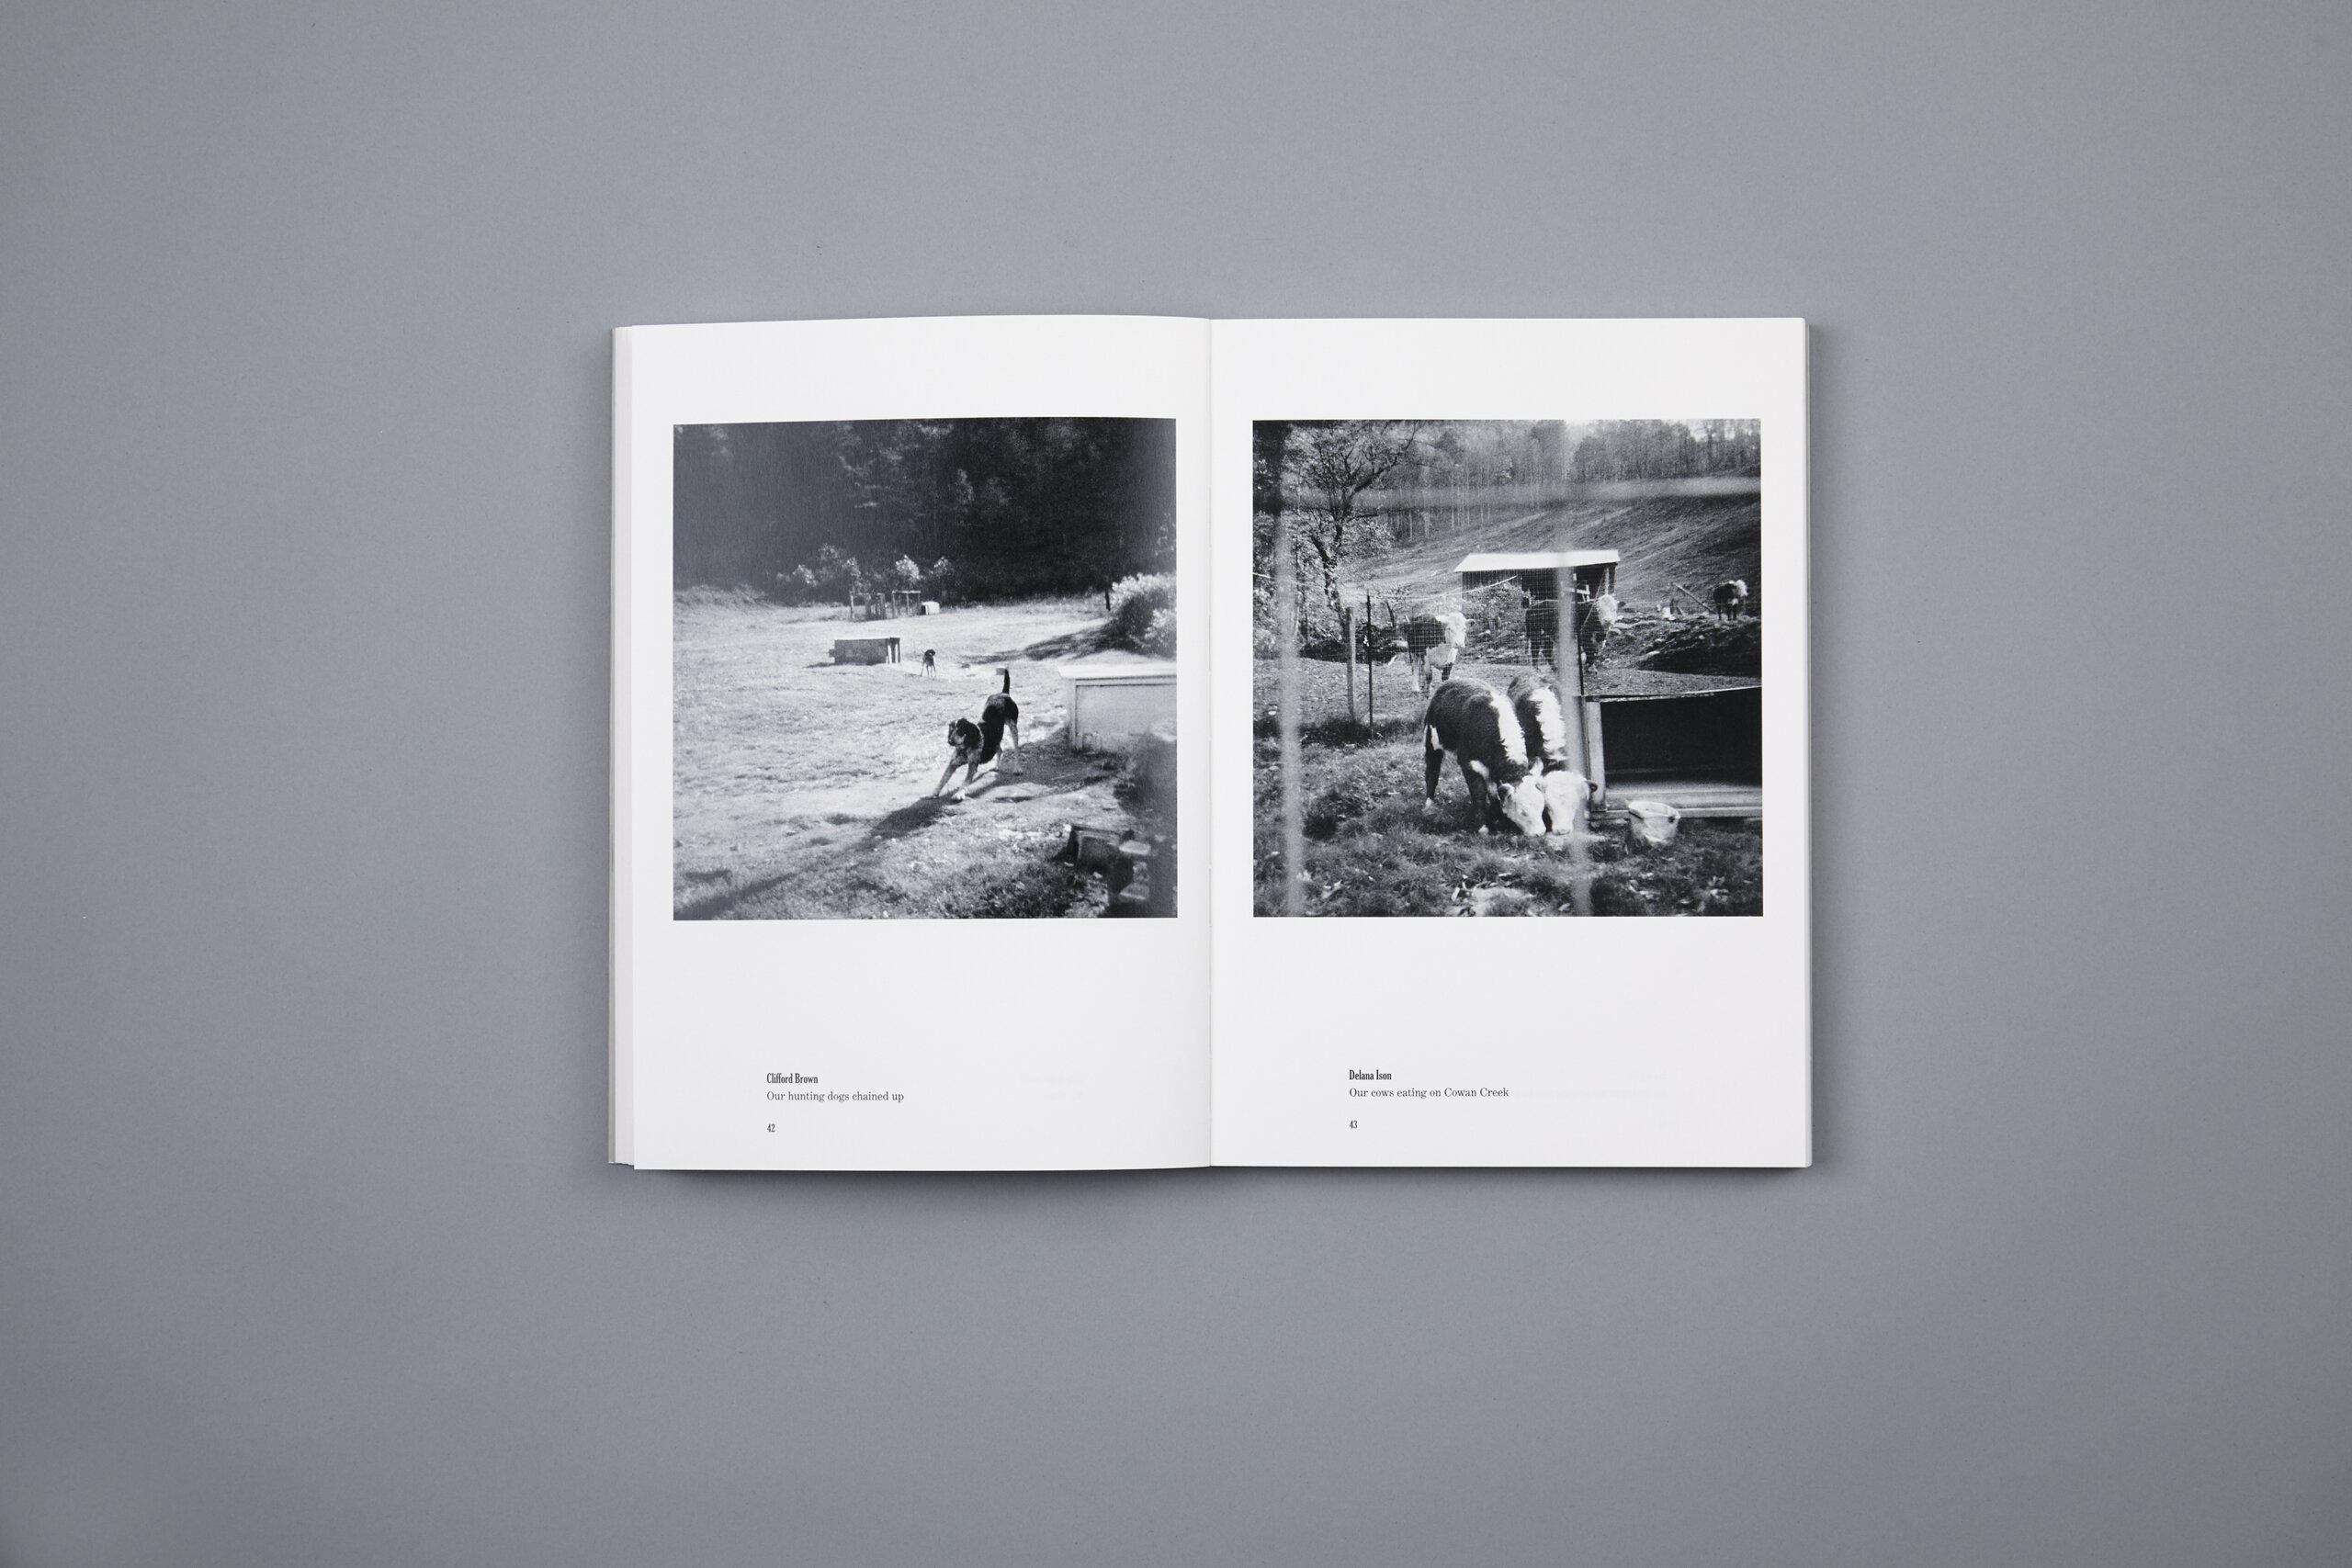 ewald-portraits-and-dreams-delpire-co